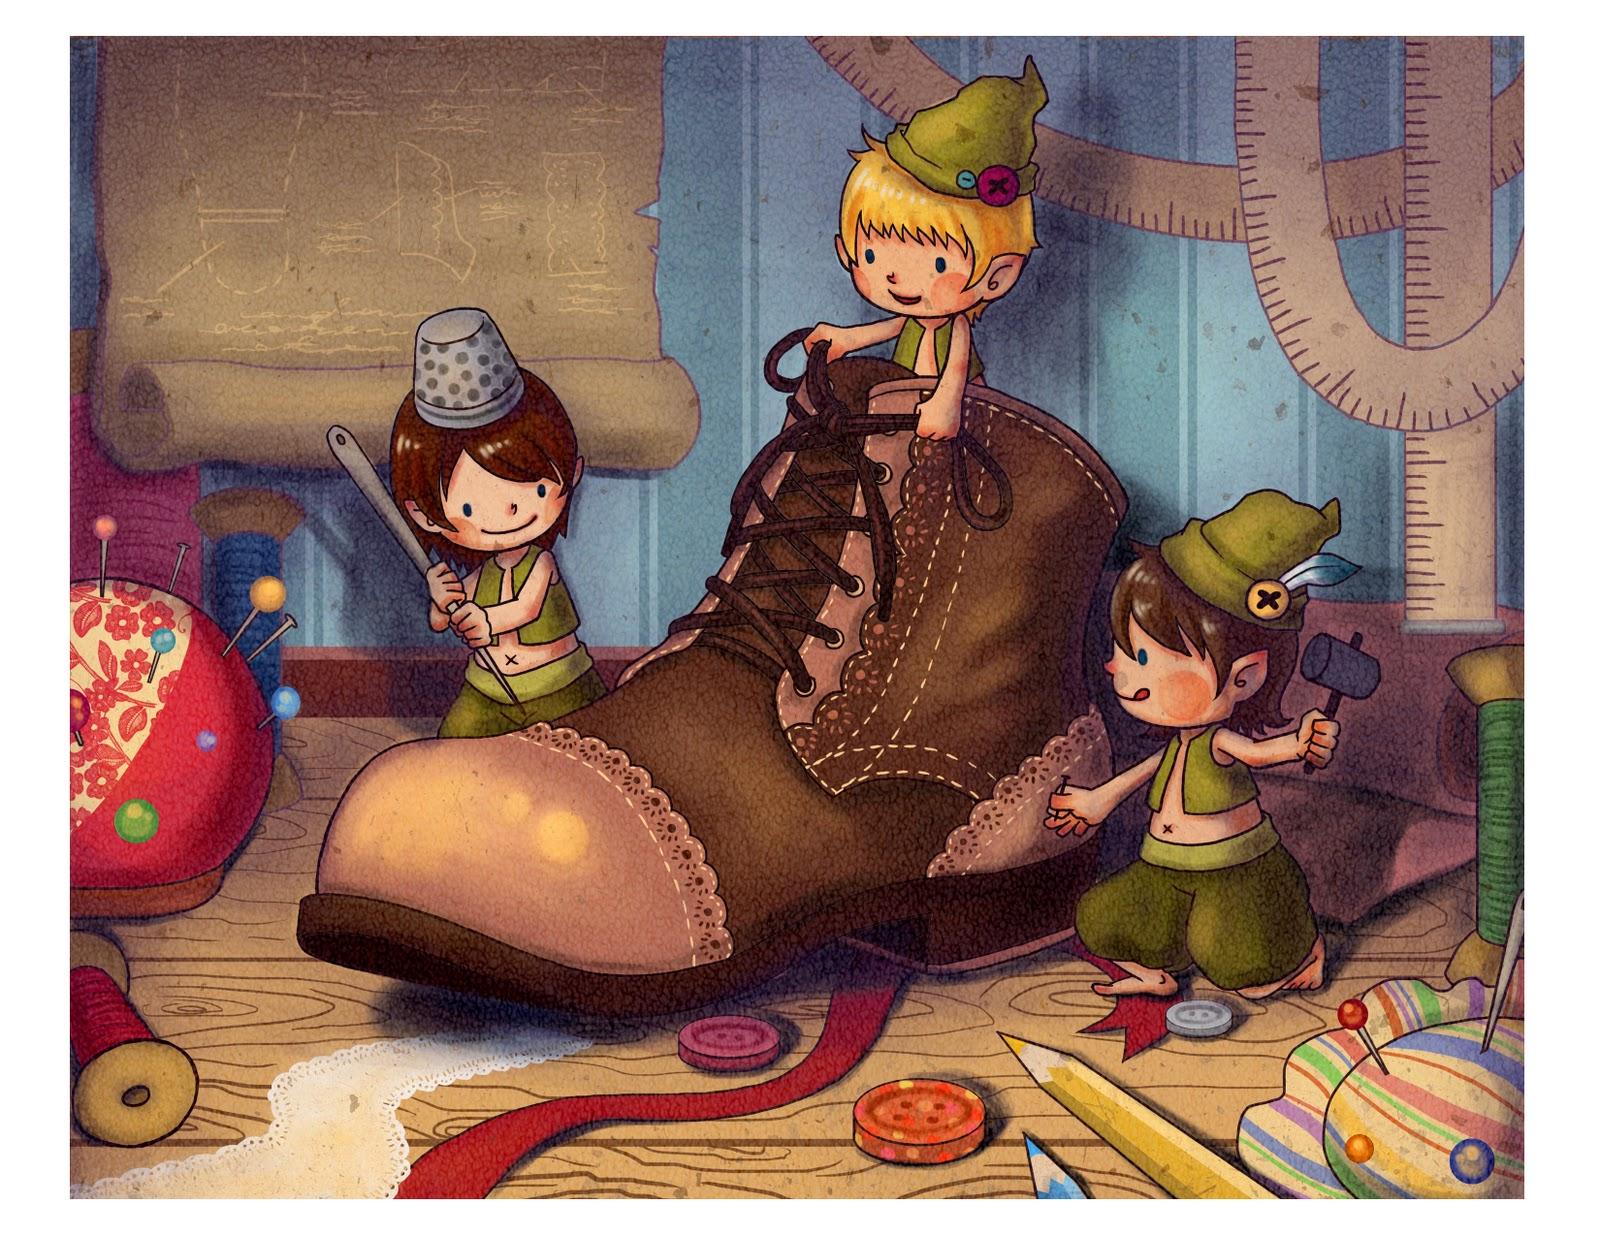 Illustration for The Elves and the Shoemaker - shoemaker